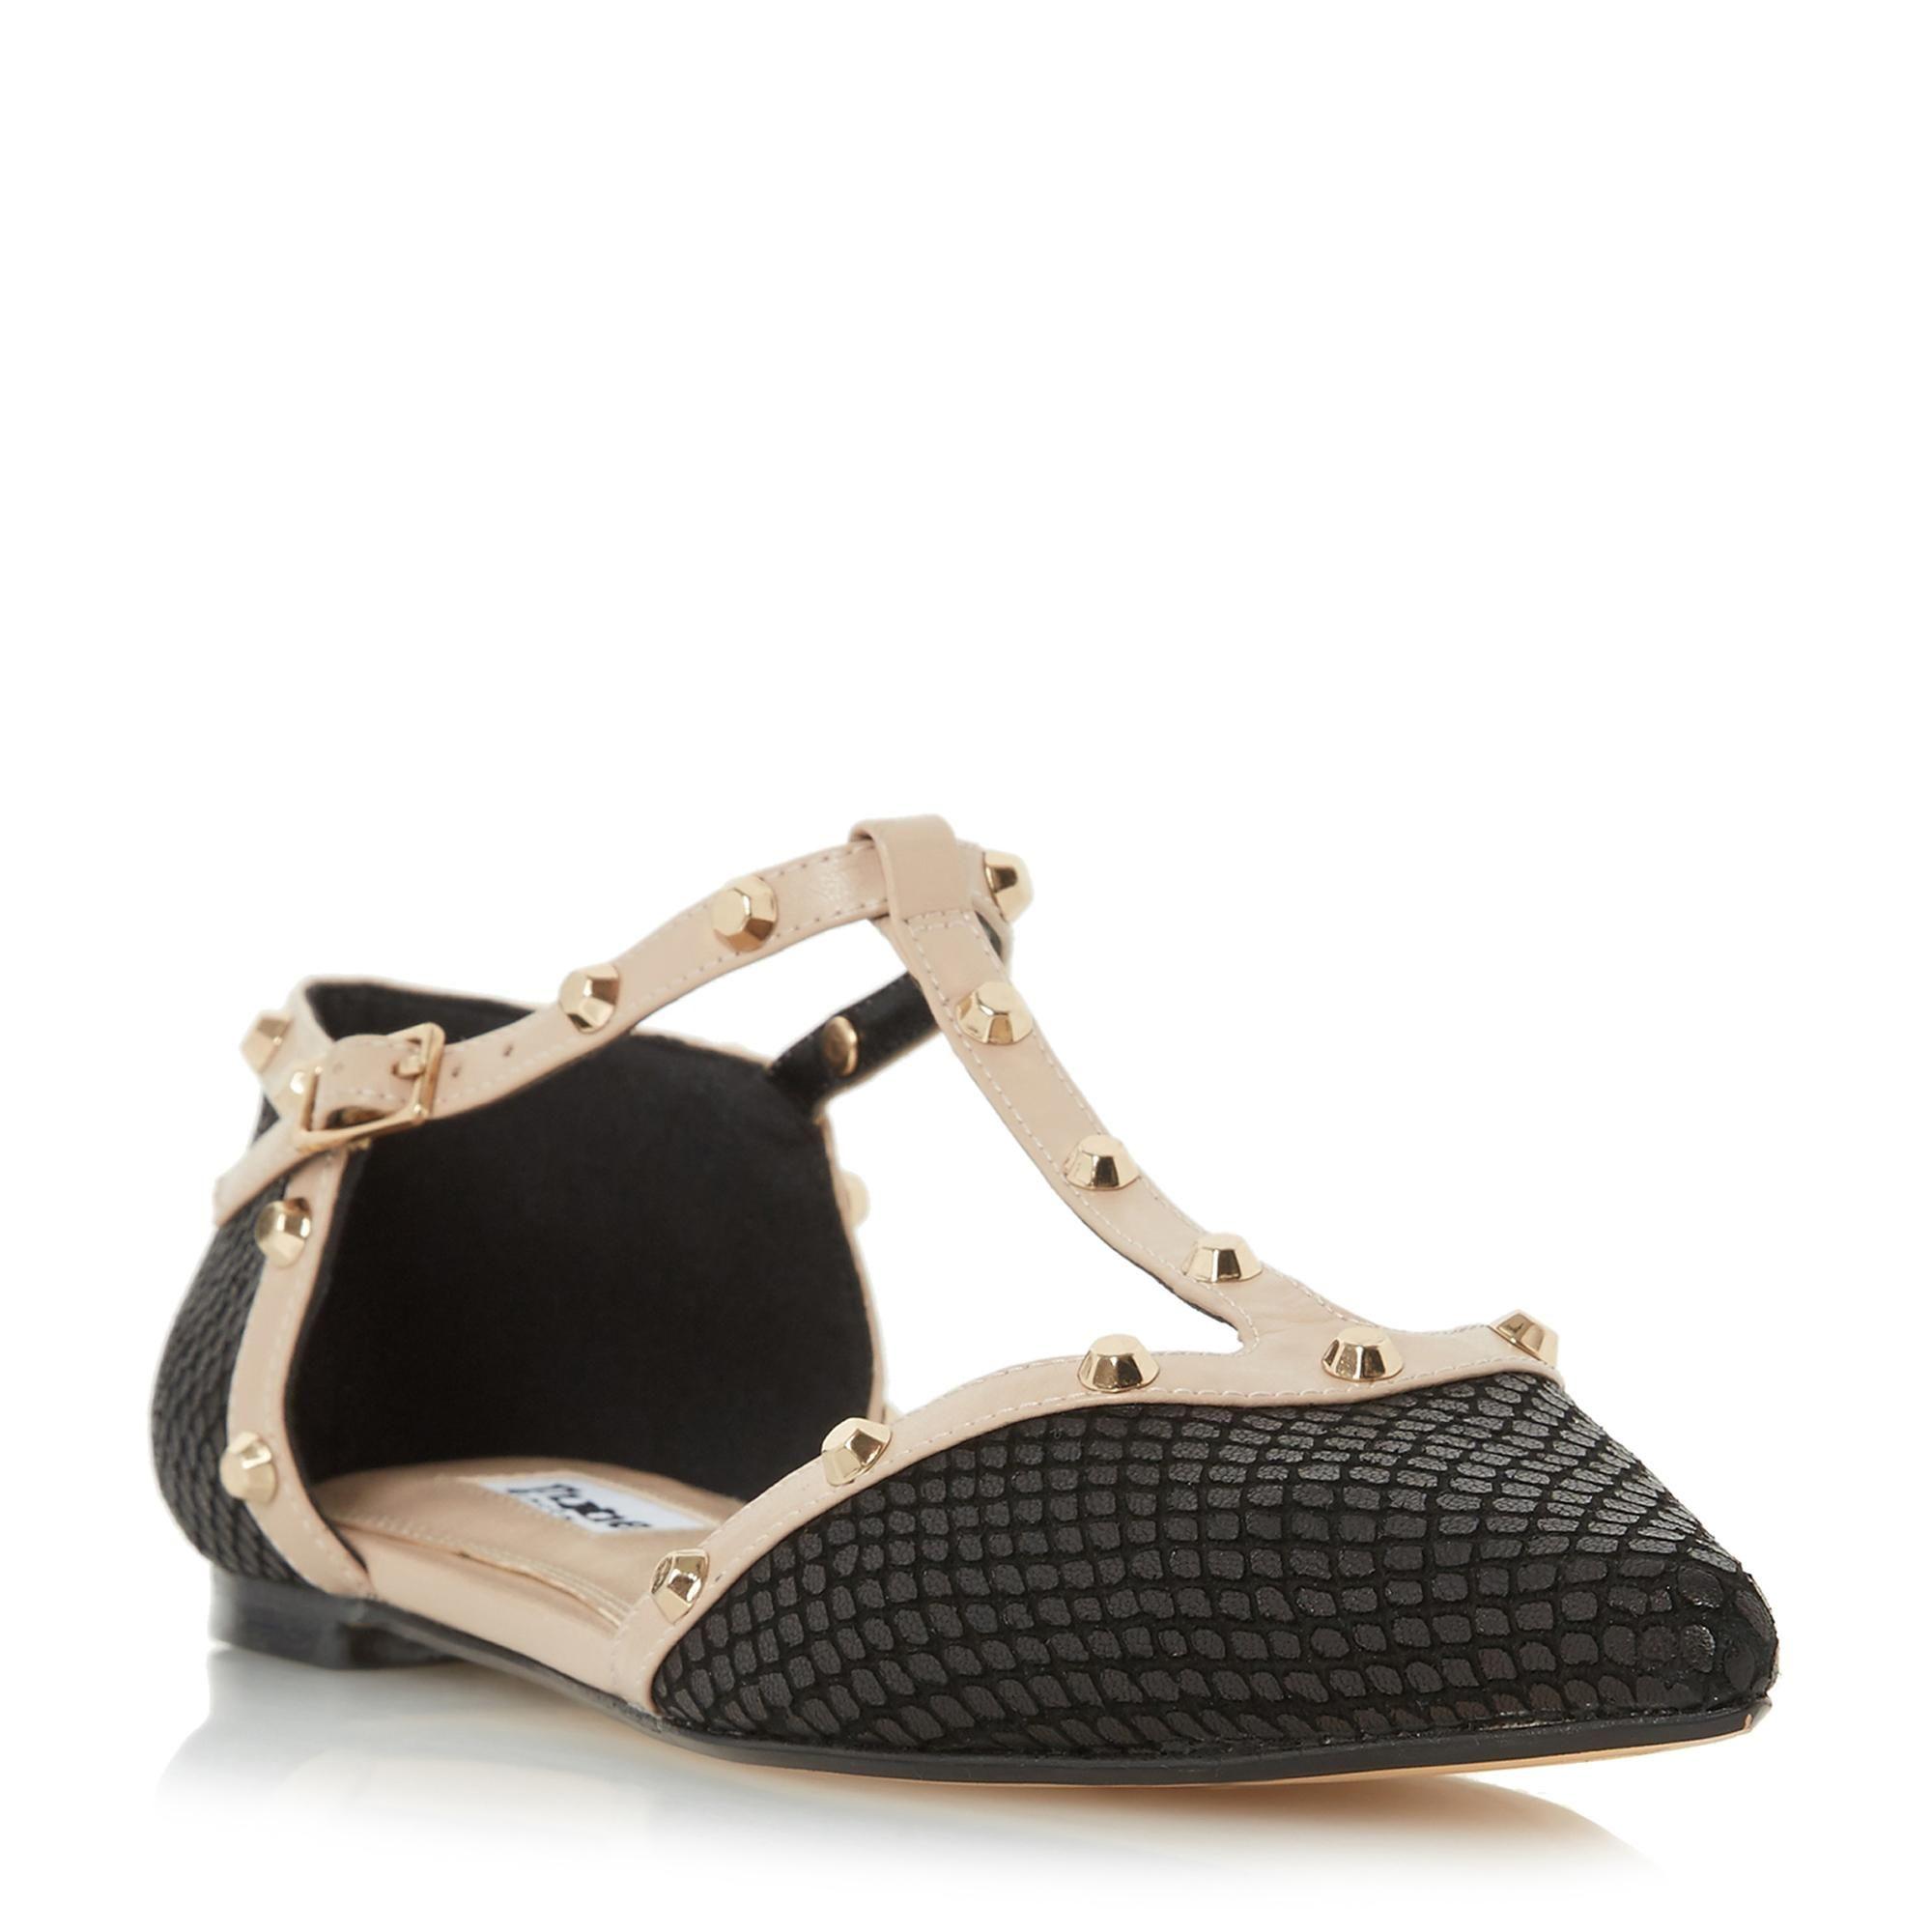 DUNE DAMEN – HETI – Flache, spitze Schuhe mit Nieten – Schwarz | Dune-Schuhe online